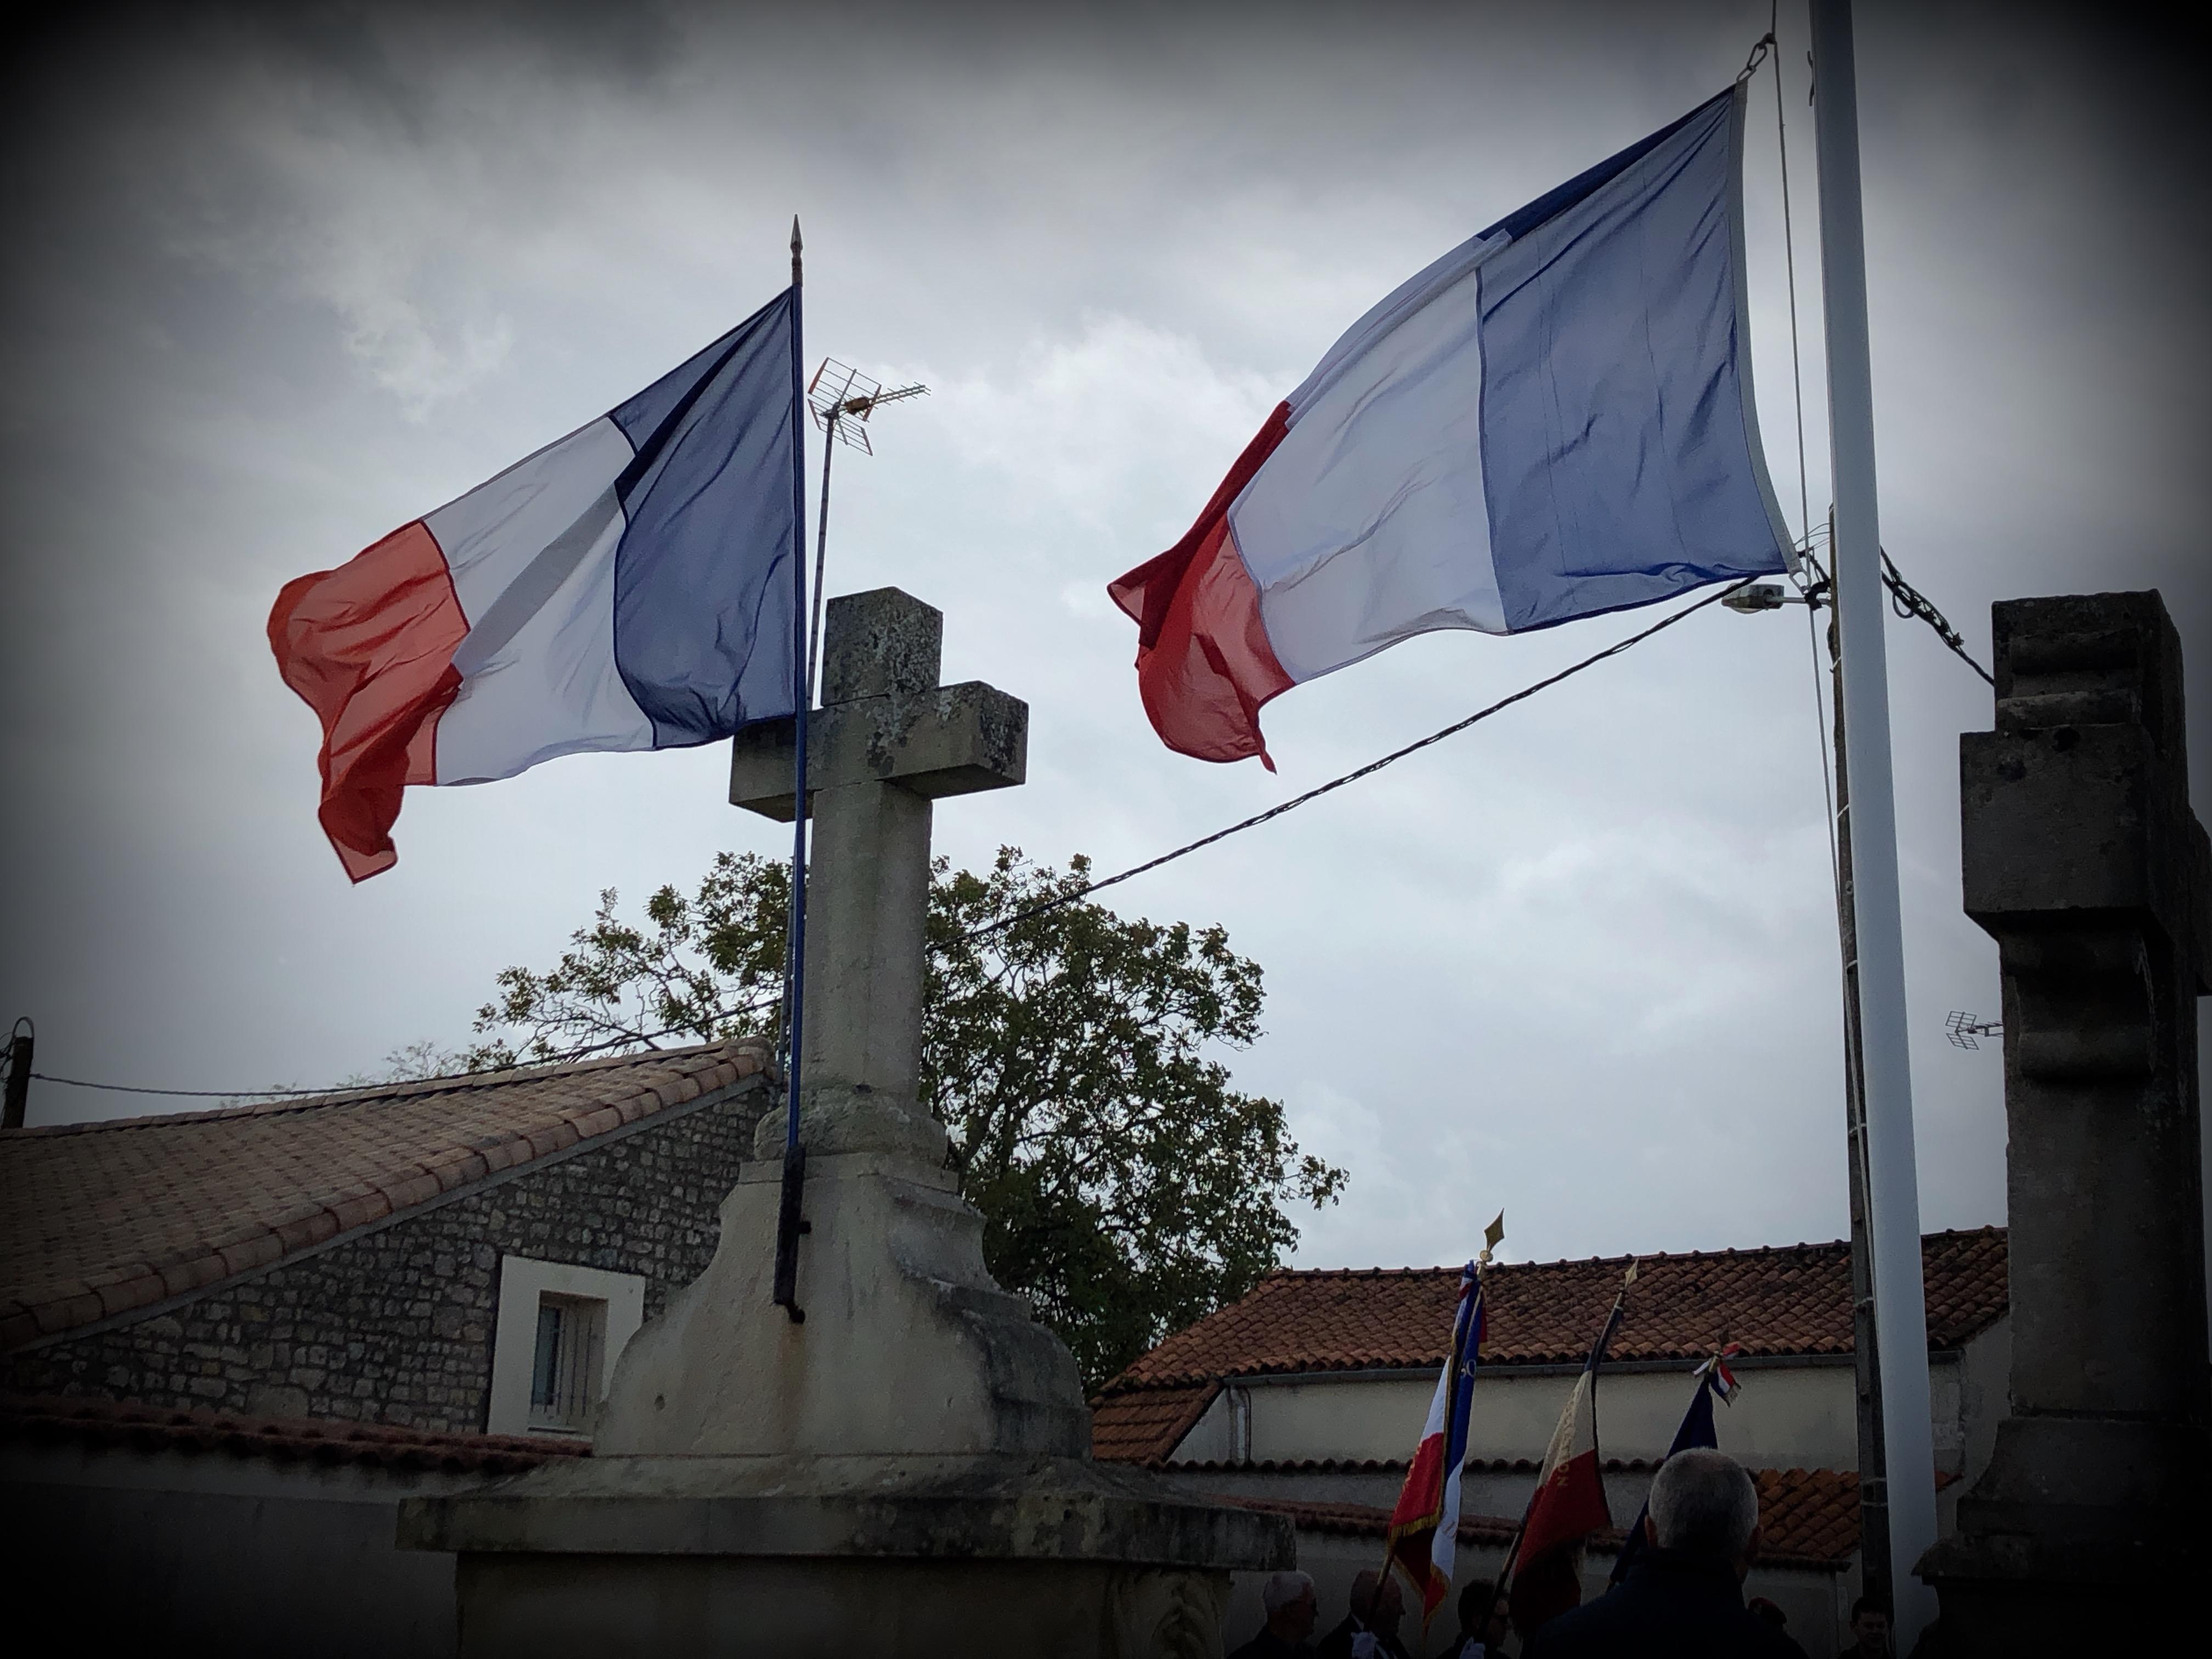 Cérémonie commémorative du 8 mai9